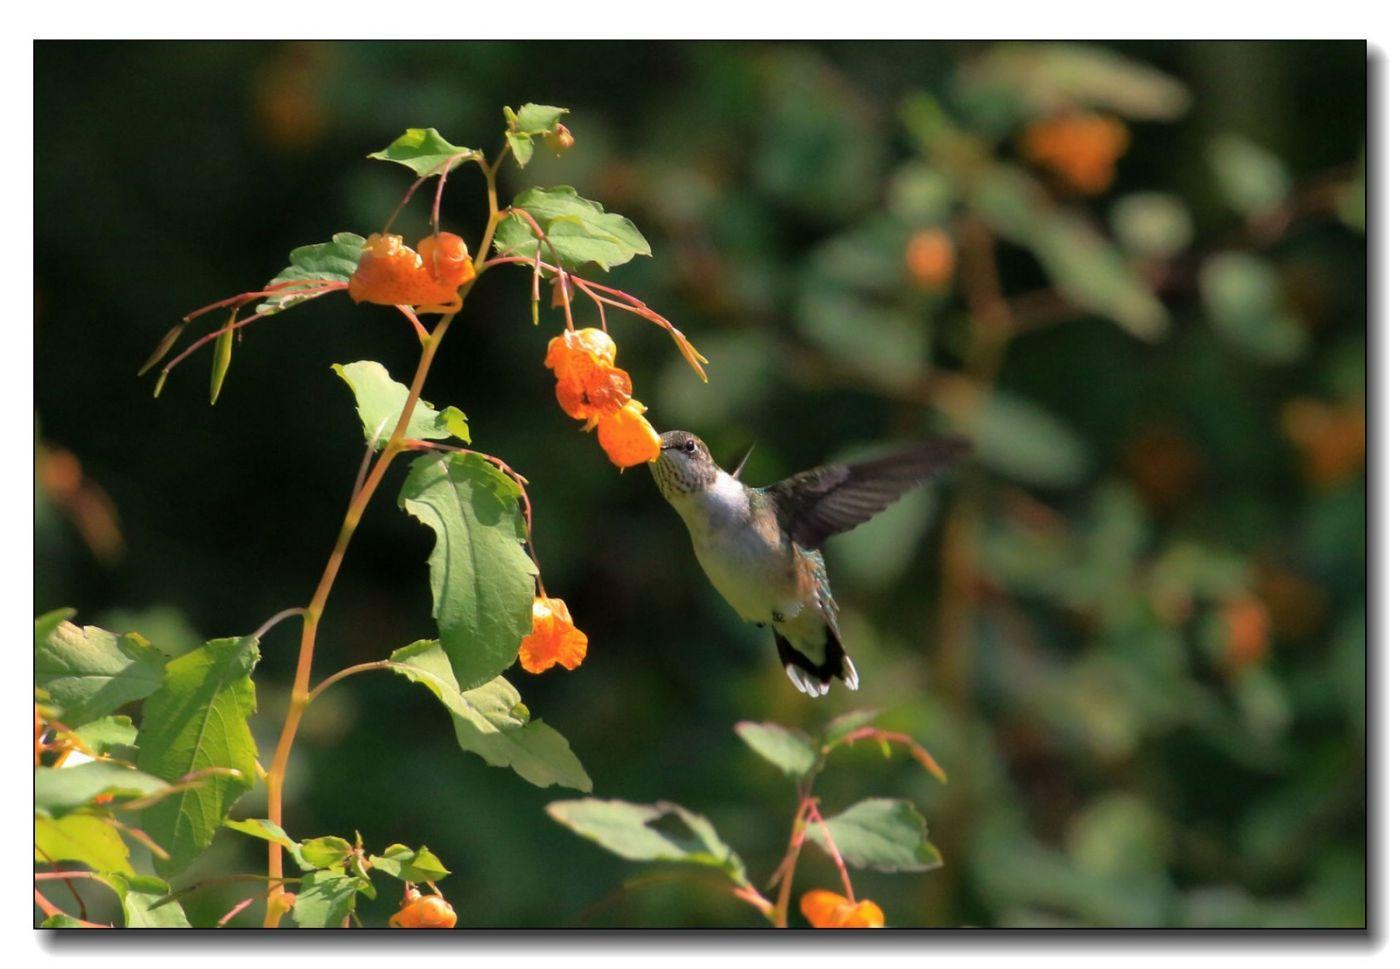 蜂鸟组图(七)_图1-6